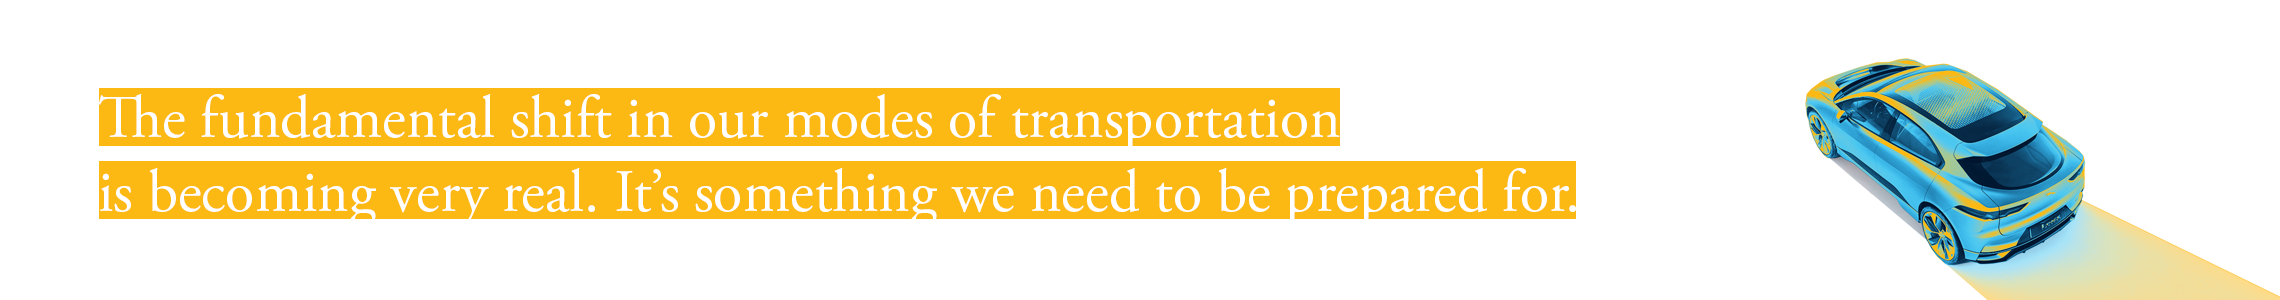 evbox manifesto electric mobility quote